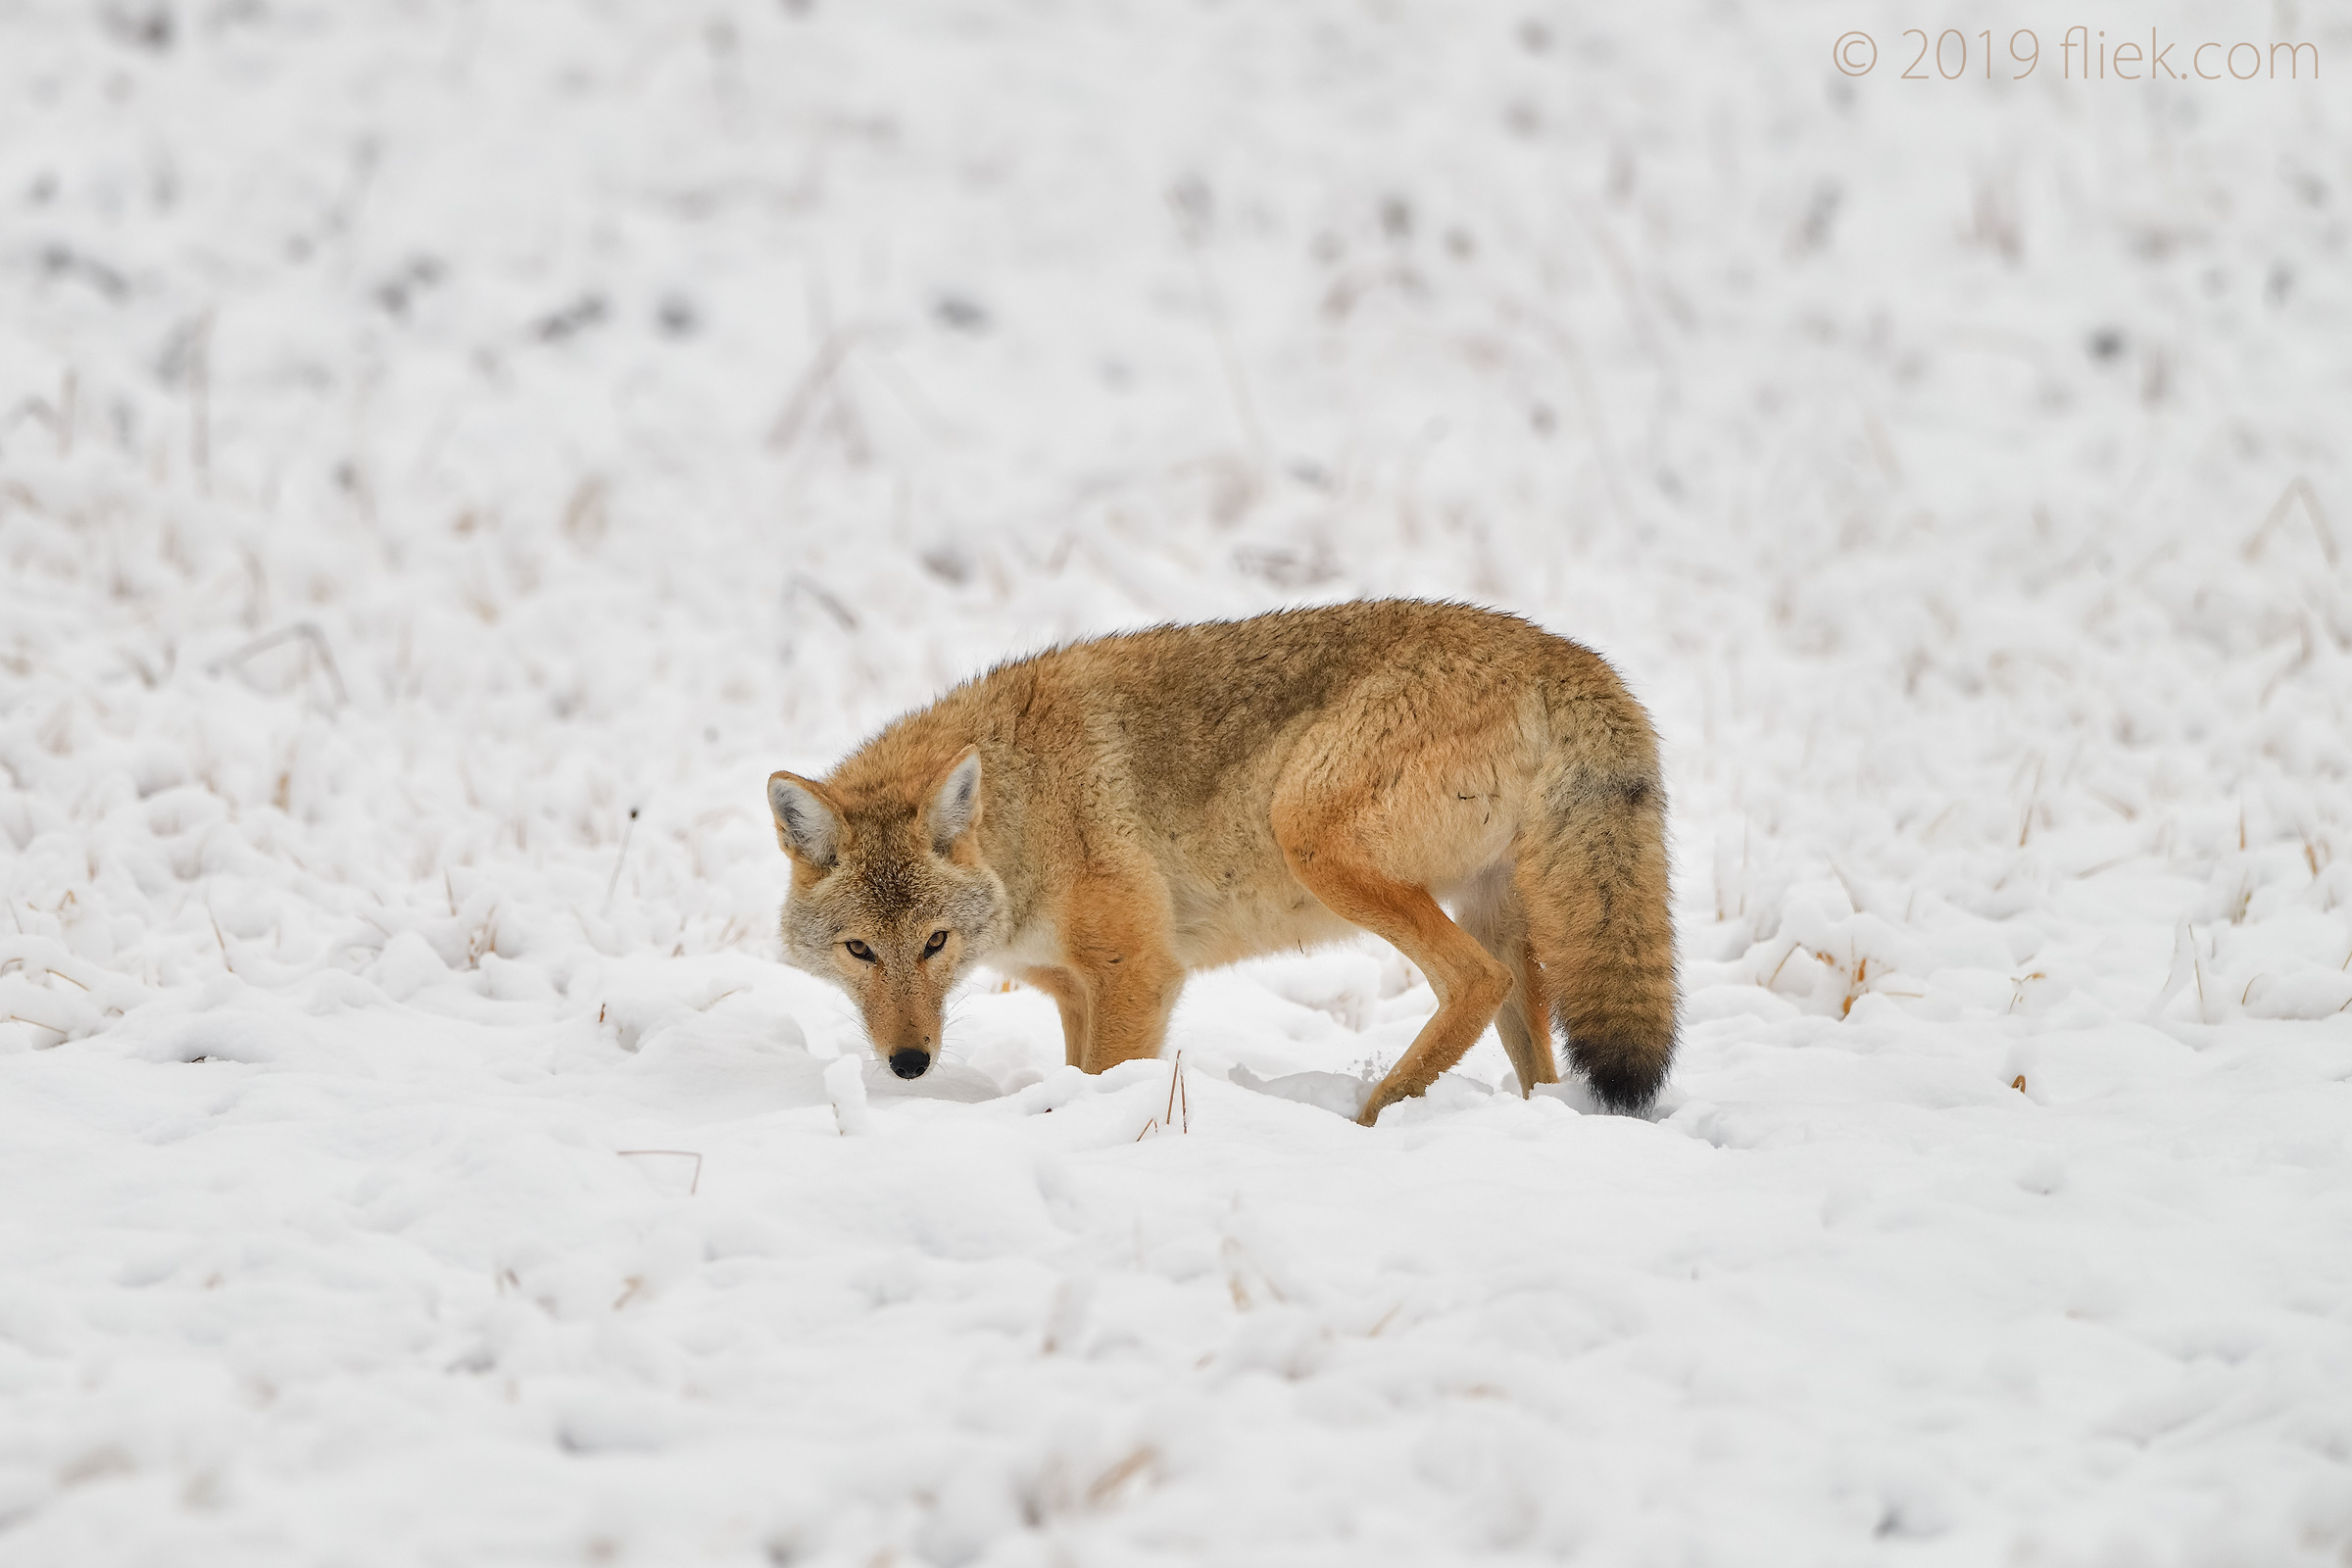 Yellowstone: snowy scenes